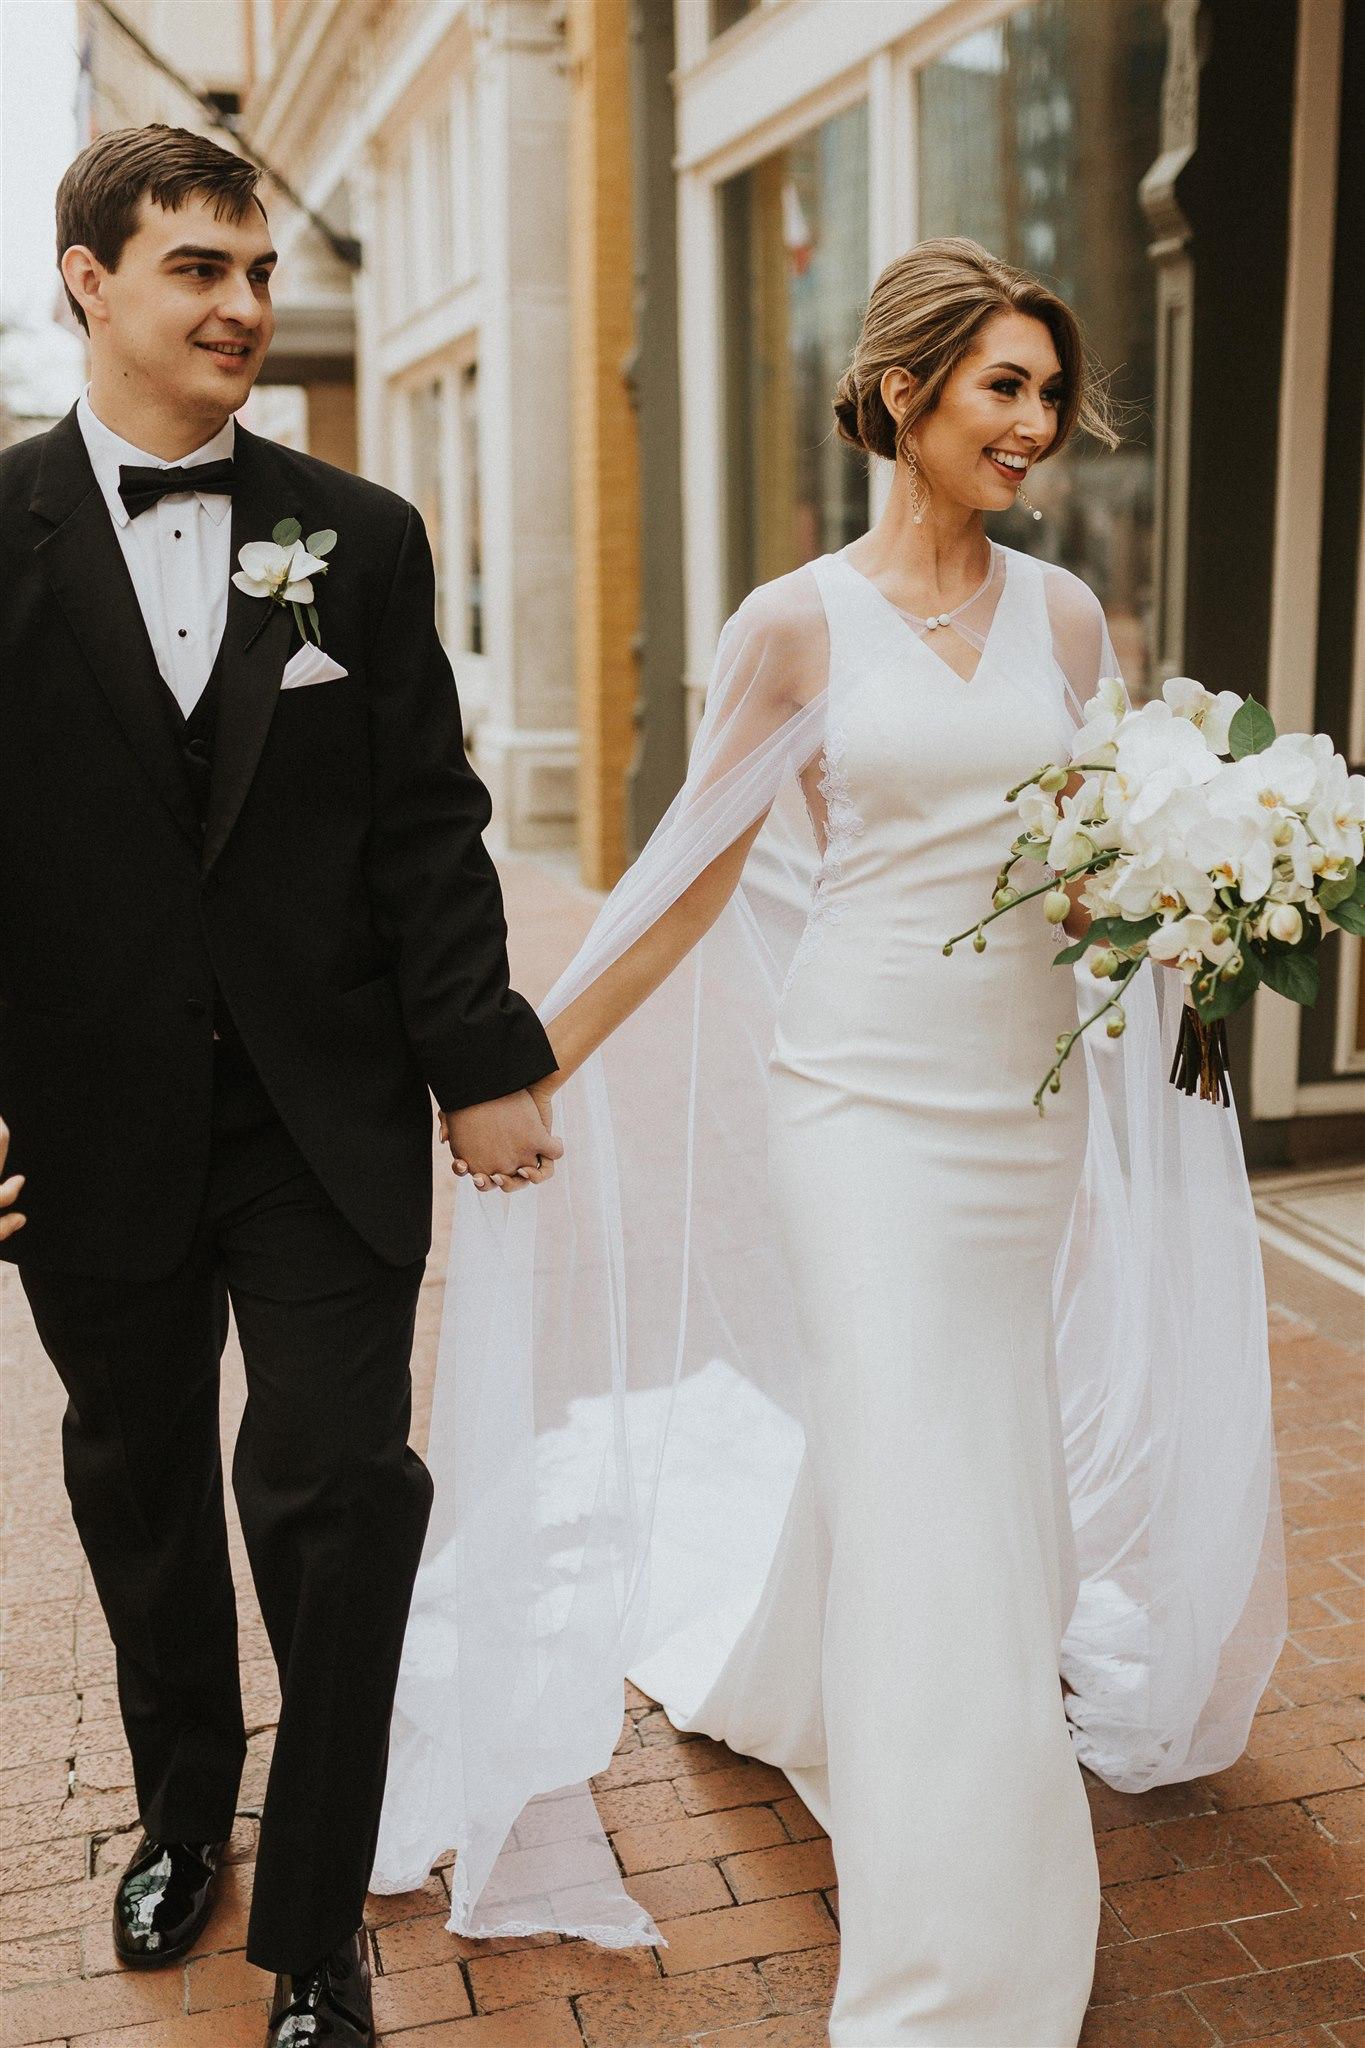 Katy-Beth-and-Ryan-For-Worth-Wedding-HauserPhotography-716.jpg